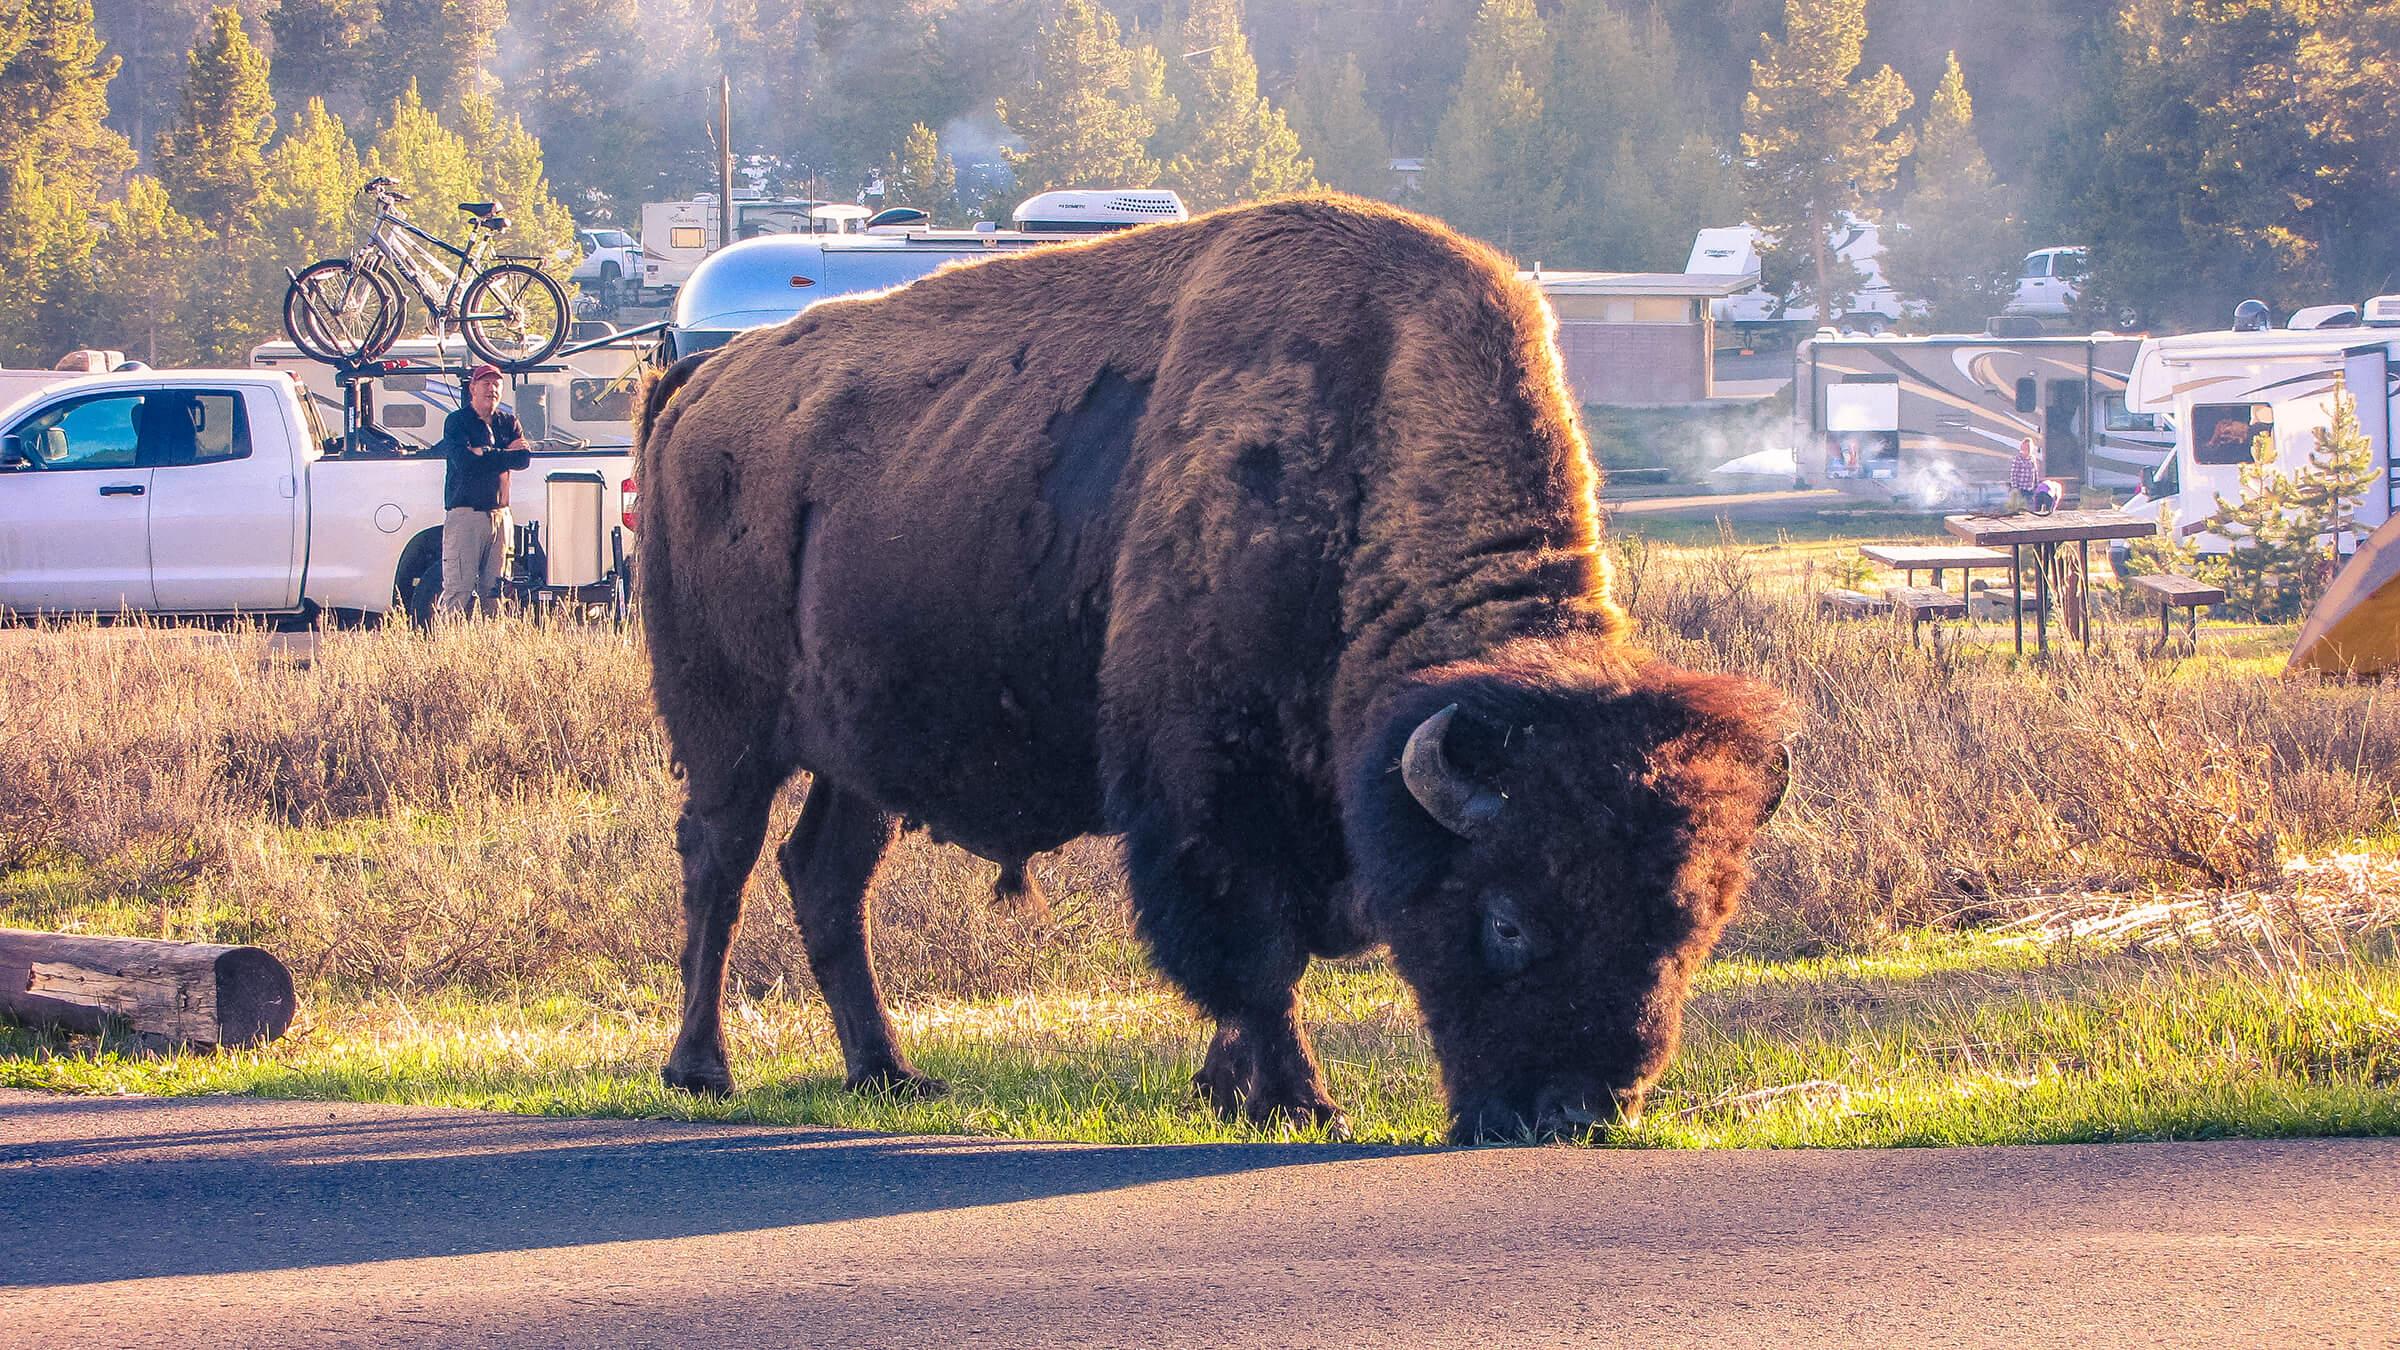 Grazing Bison at Bridge Bay Campground